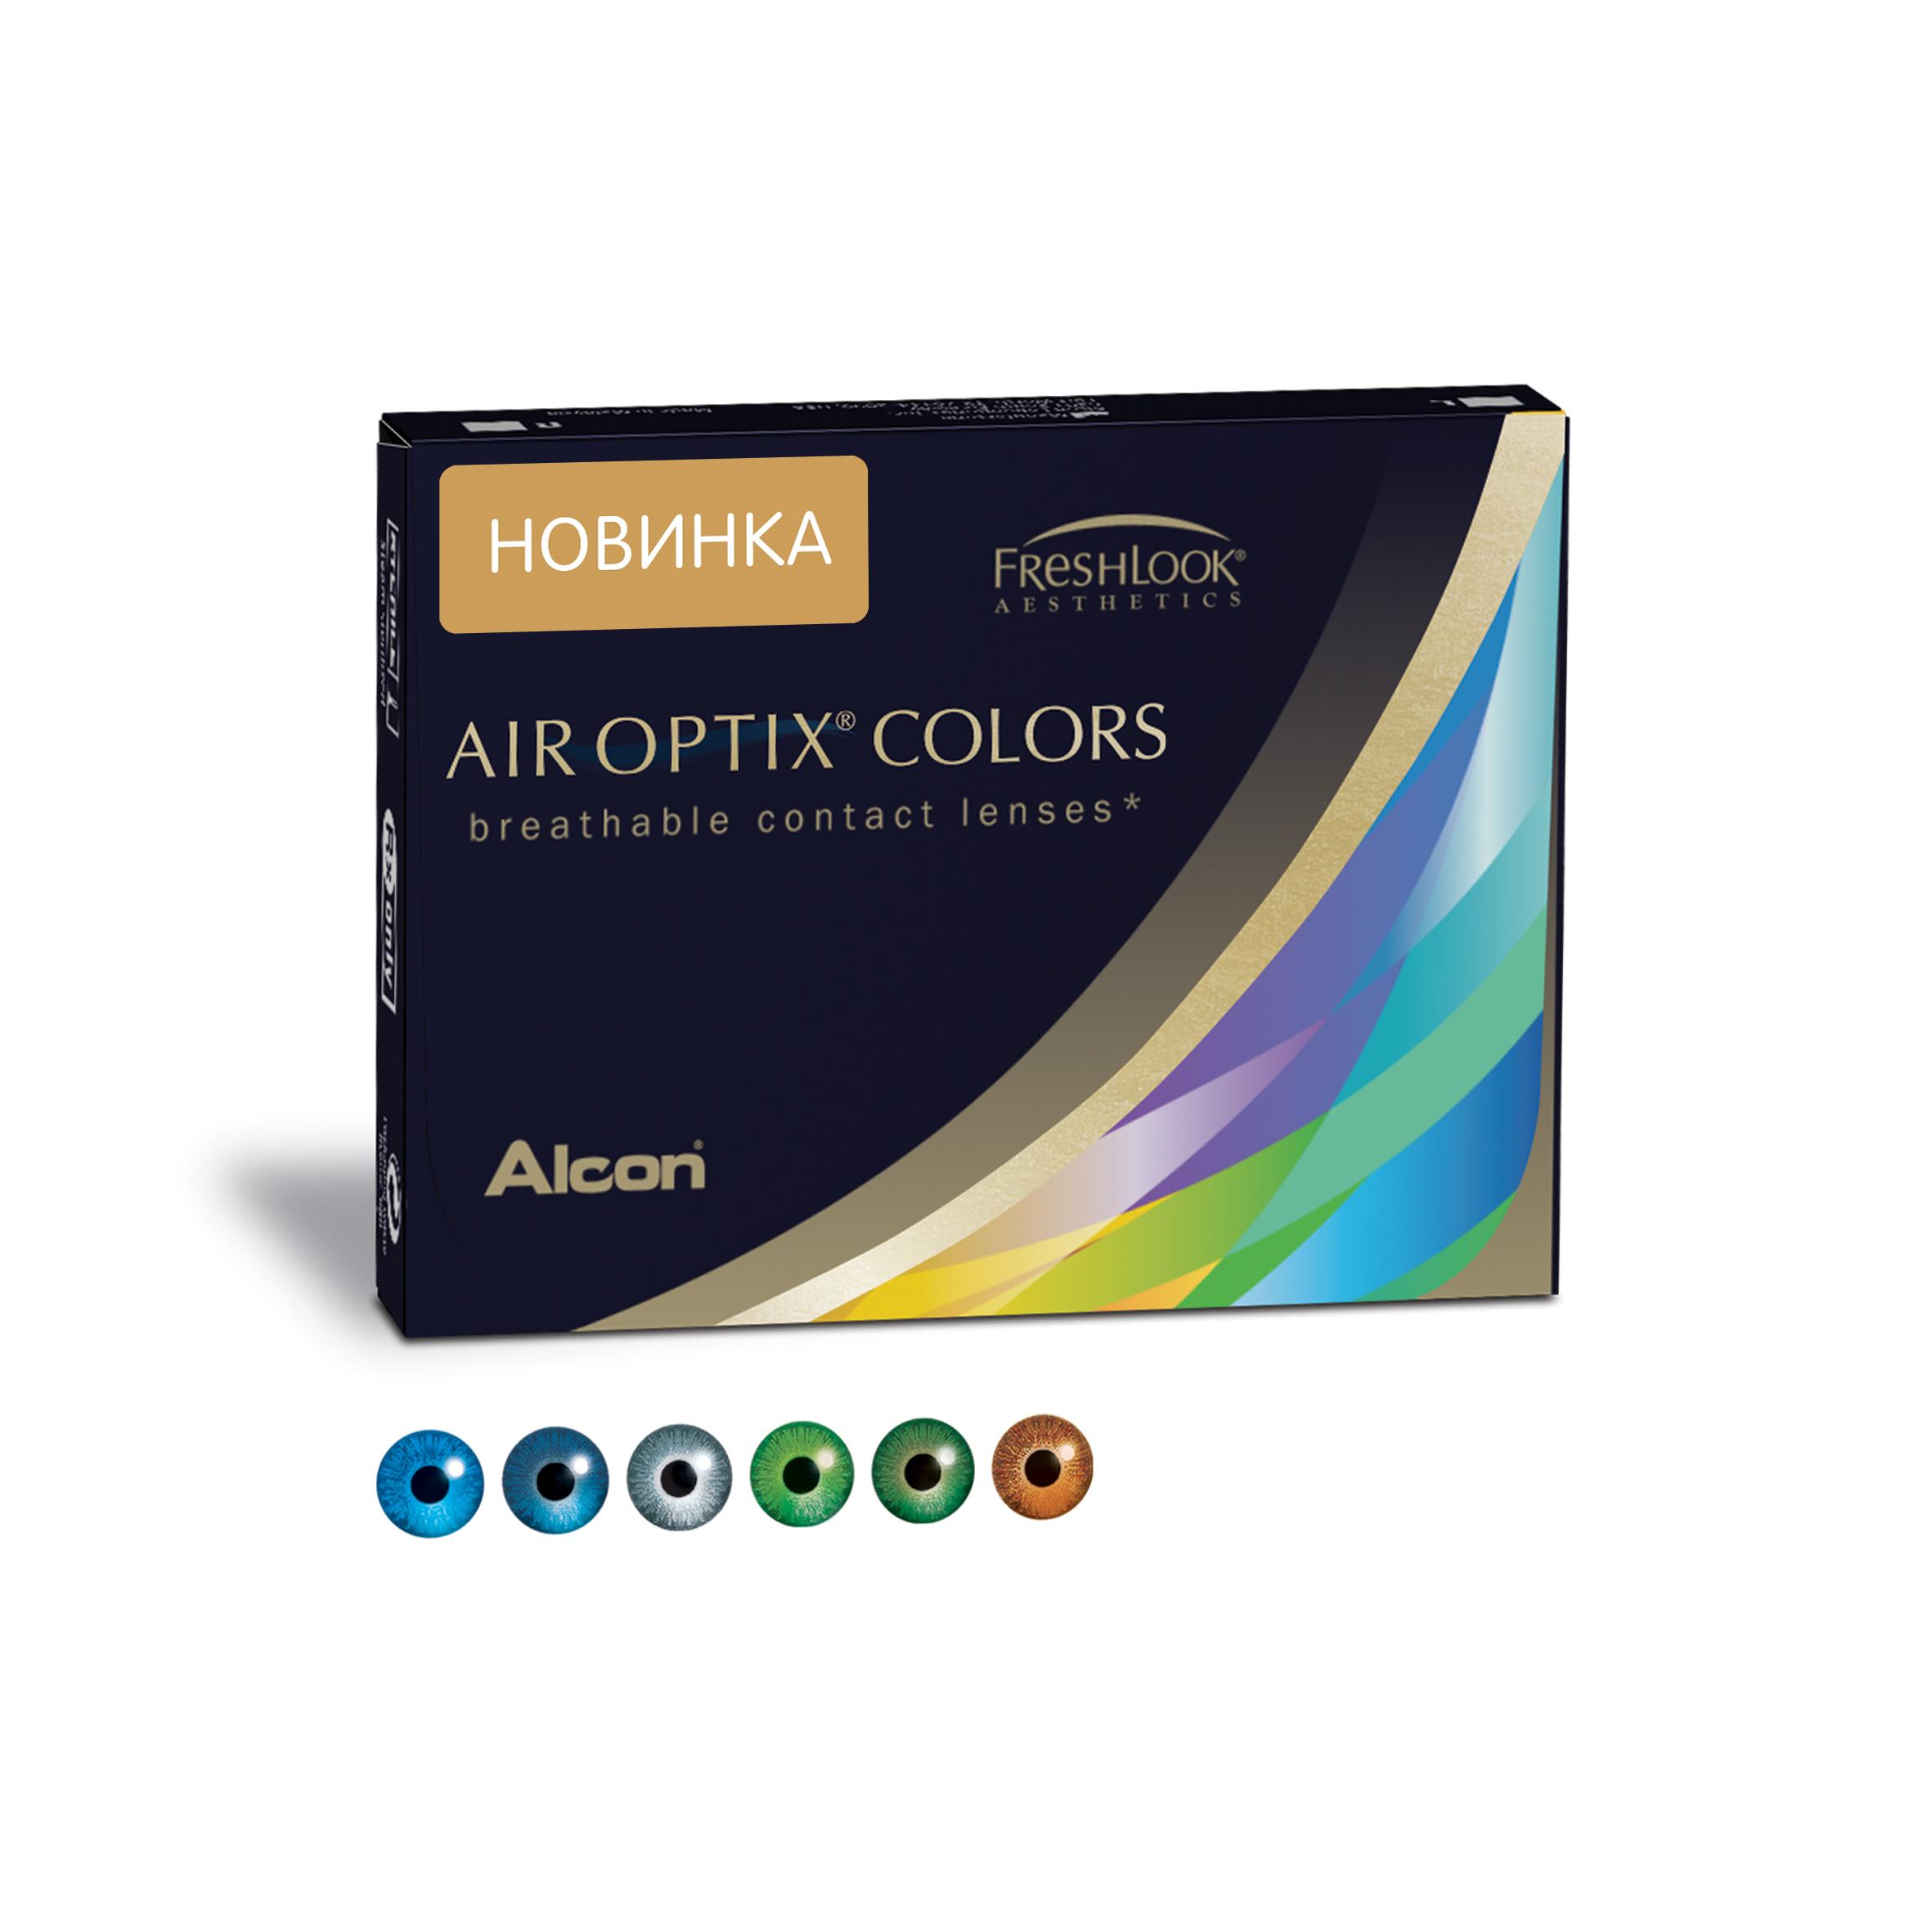 Аlcon контактные линзы Air Optix Colors 2 шт -6.50 Green31746315Мягкие контактные линзы